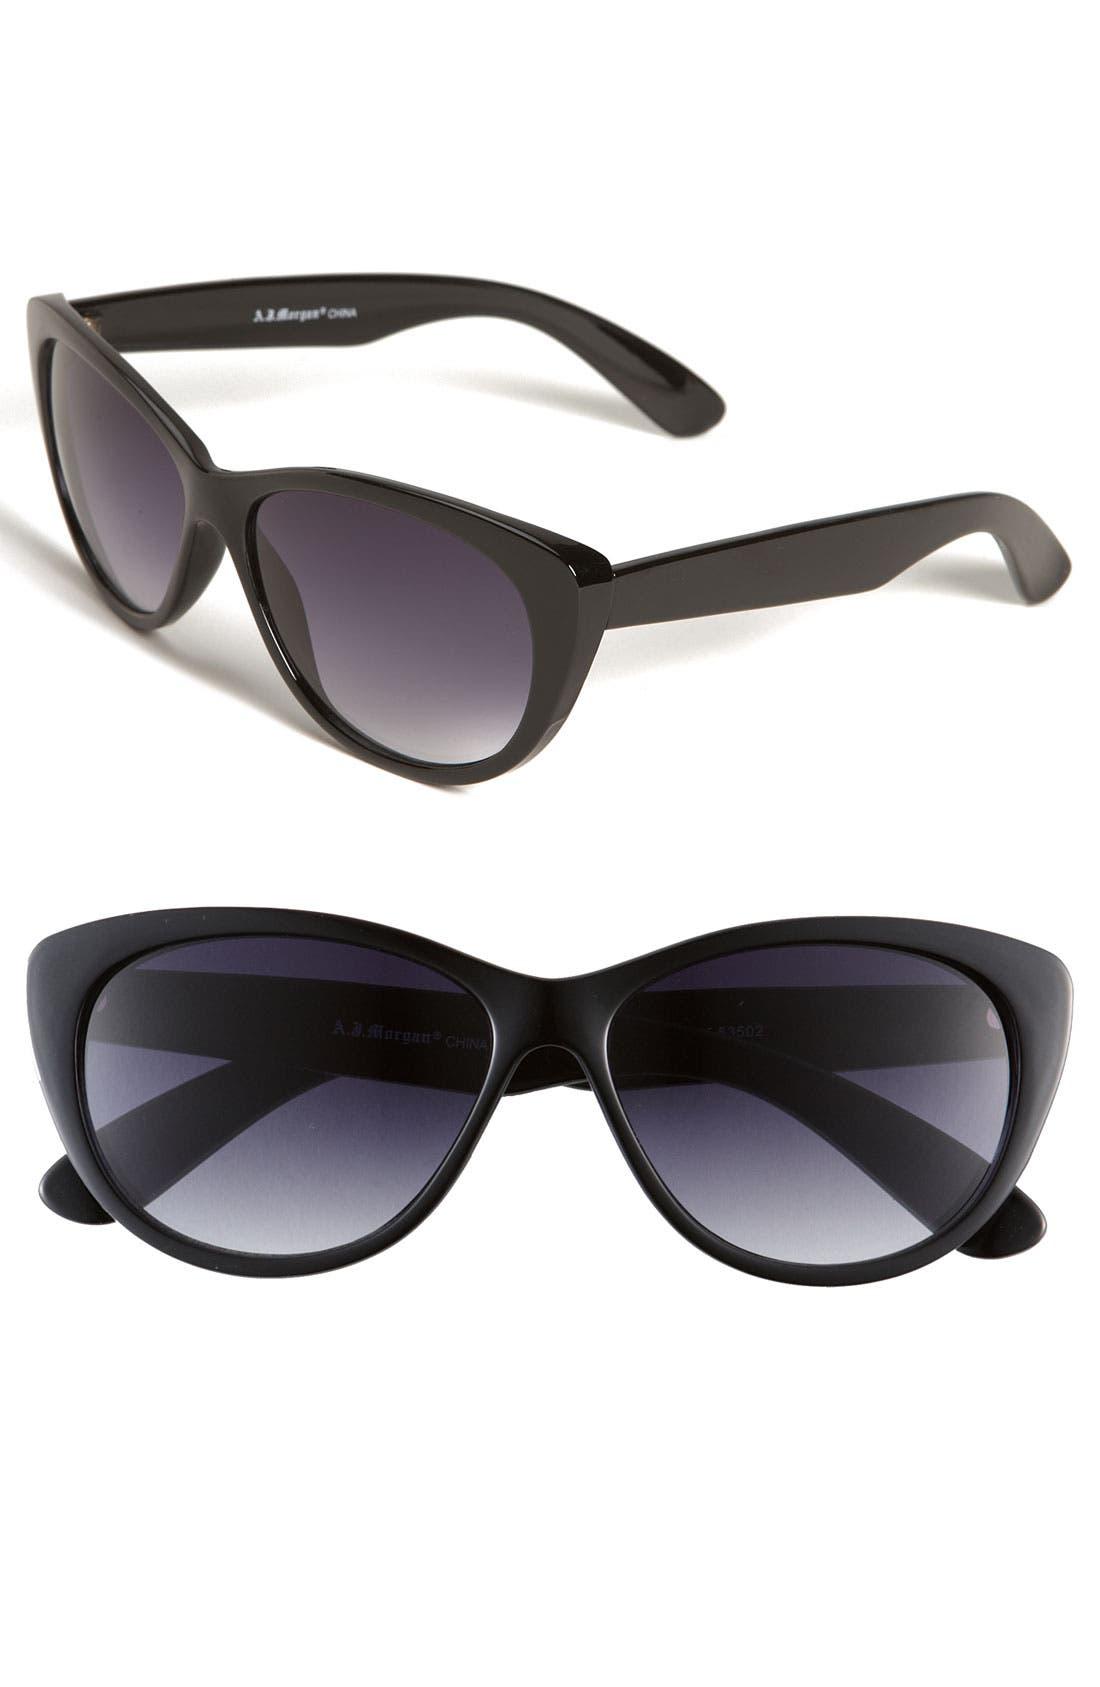 Main Image - A.J. Morgan 'Lana' 57mm Sunglasses